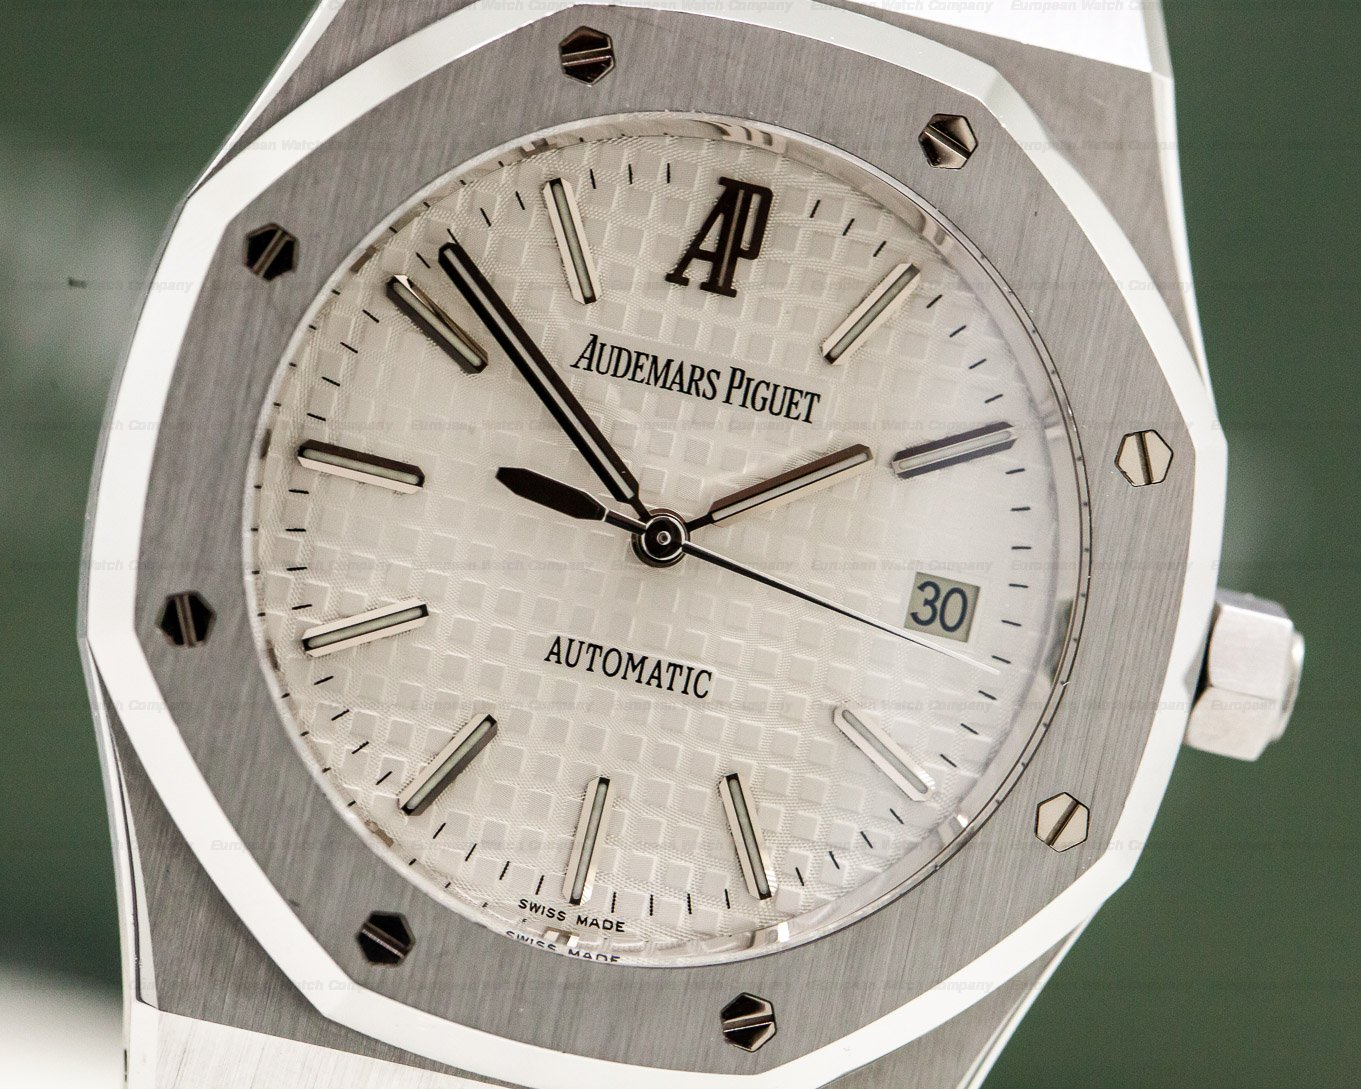 Audemars Piguet 15300ST.OO.1220ST.01 Royal Oak Stainless Steel 39MM UNPOLISHED